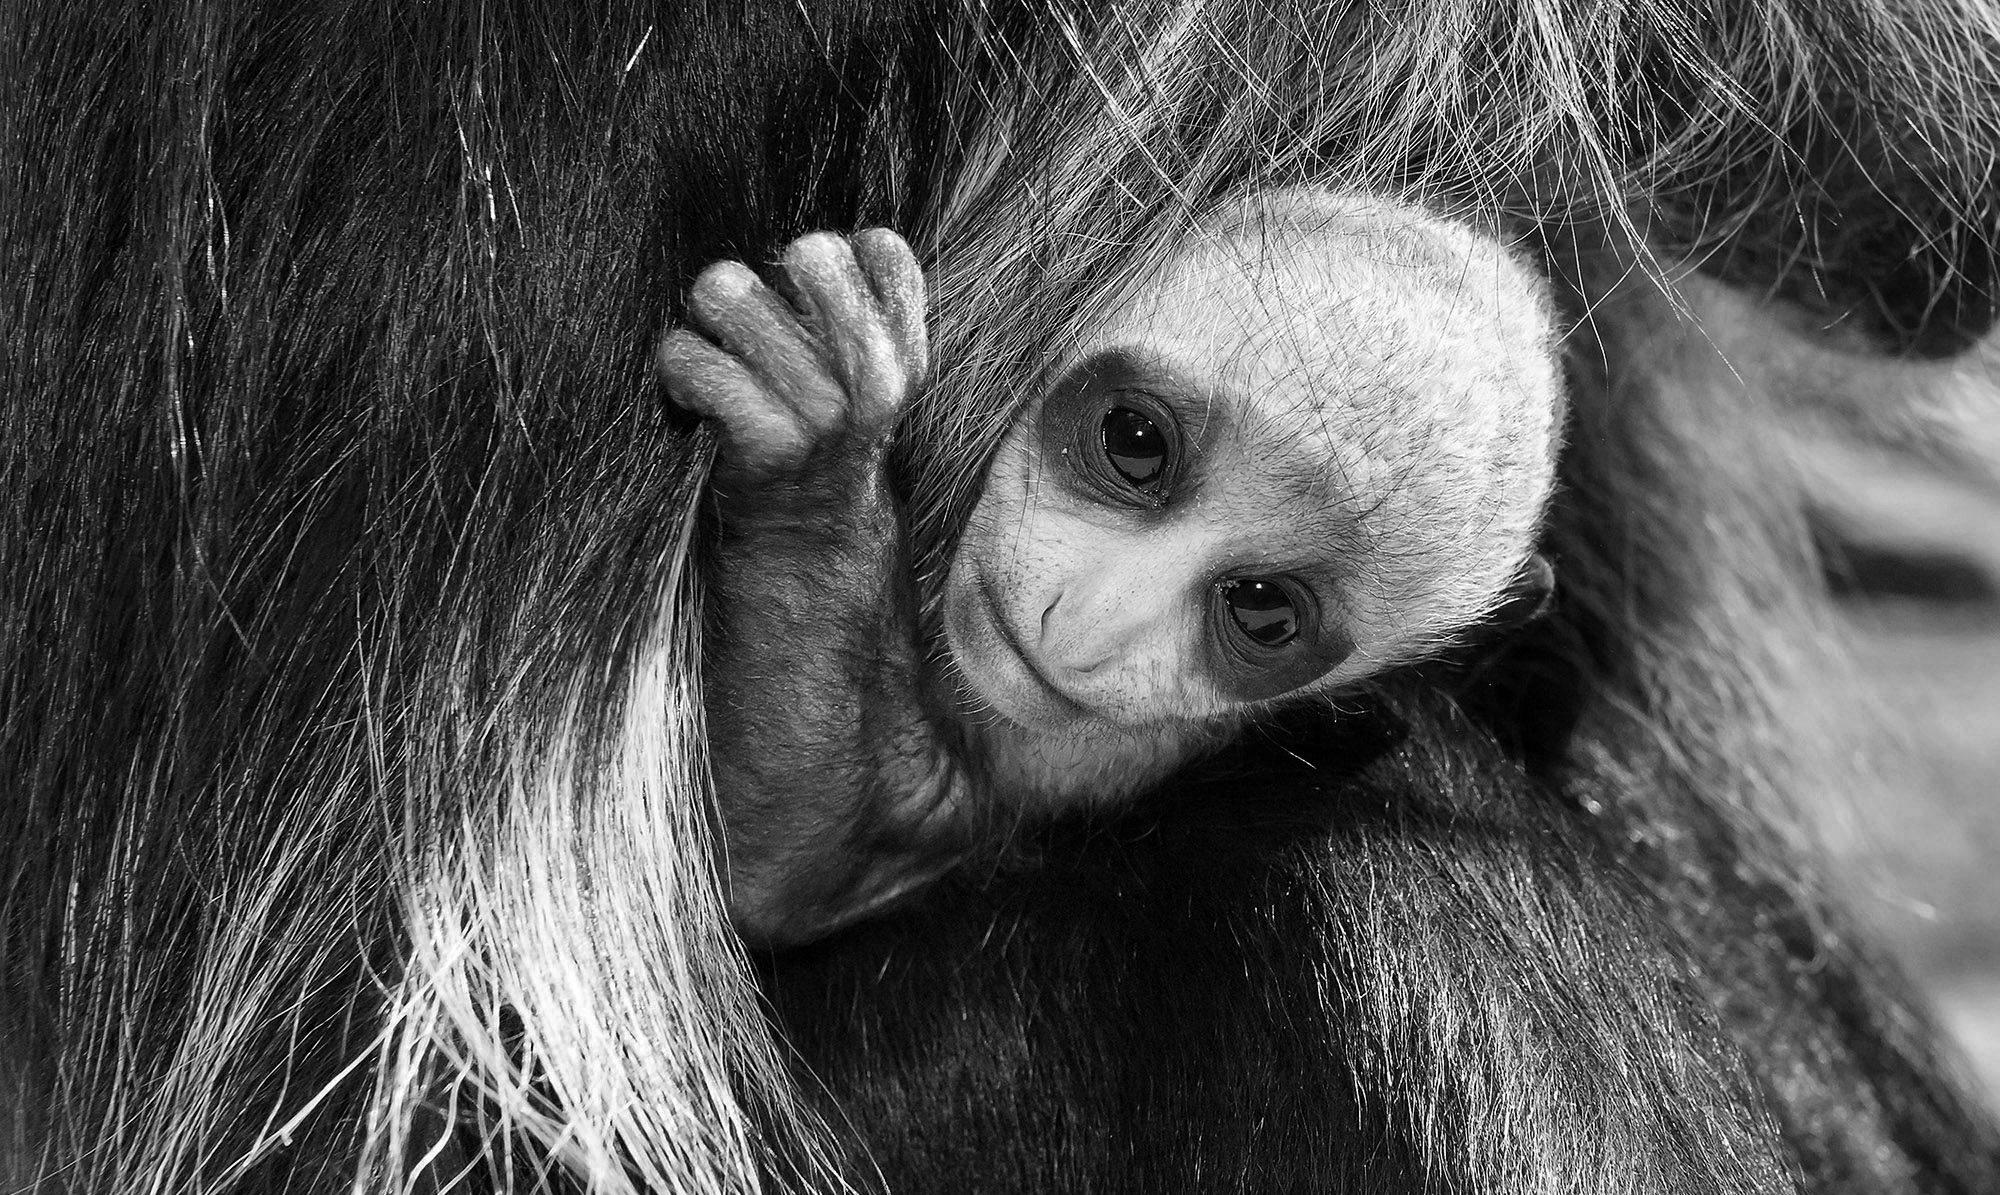 Cute Rare Baby Monkey Born In Worlds Oldest Zoo - Ananova